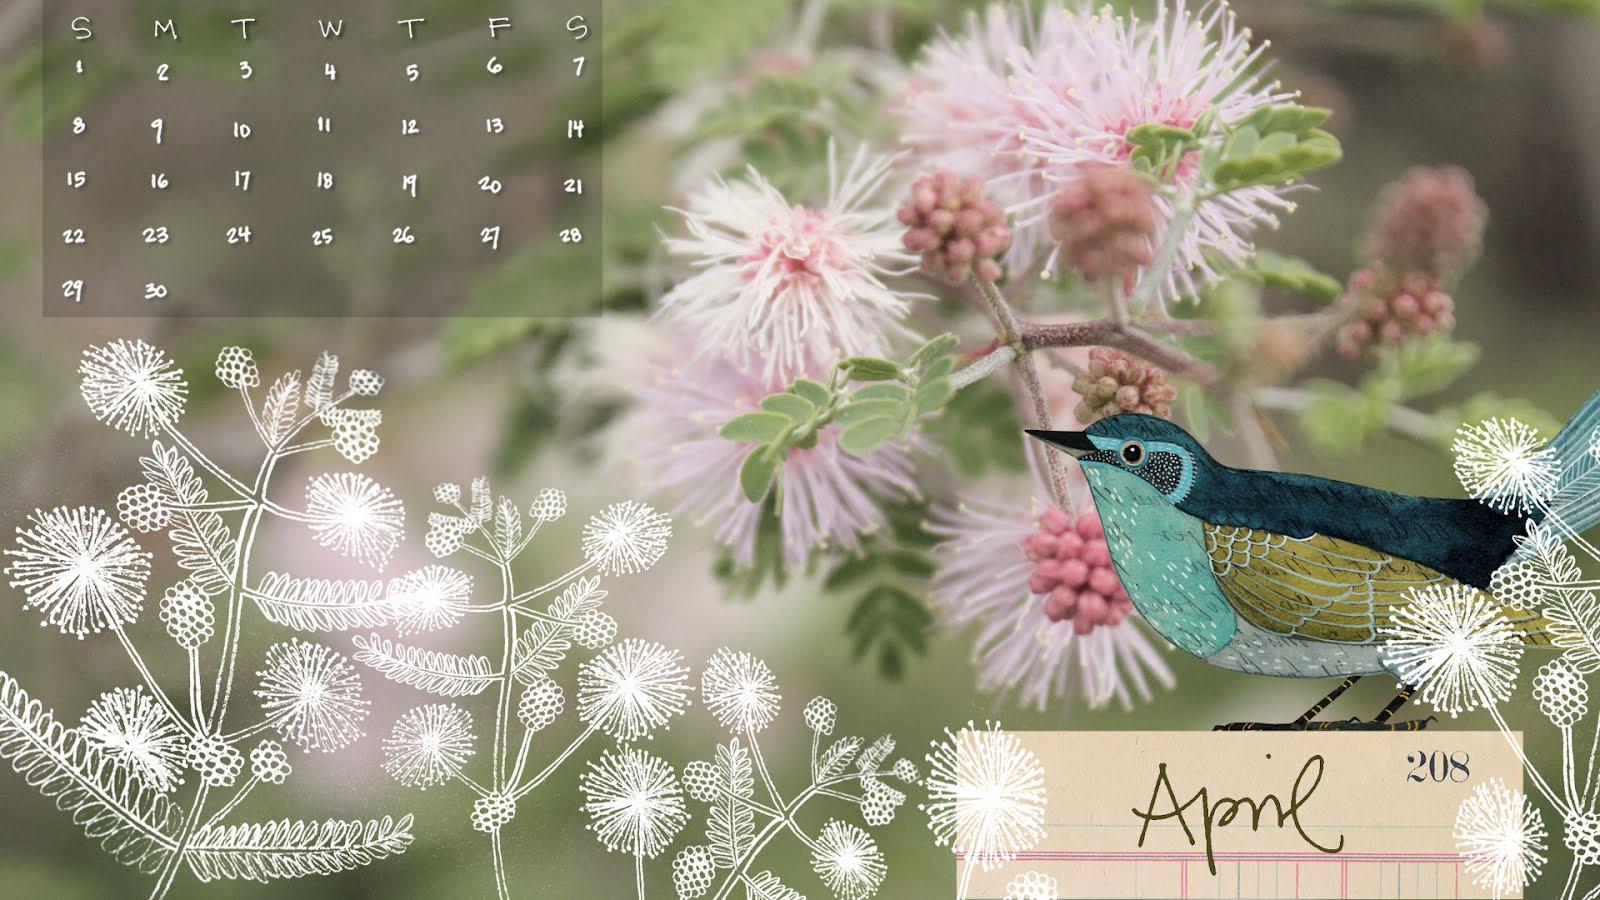 April 2012 desktop calendar wallpaper Geninnes Art blog 1600x900